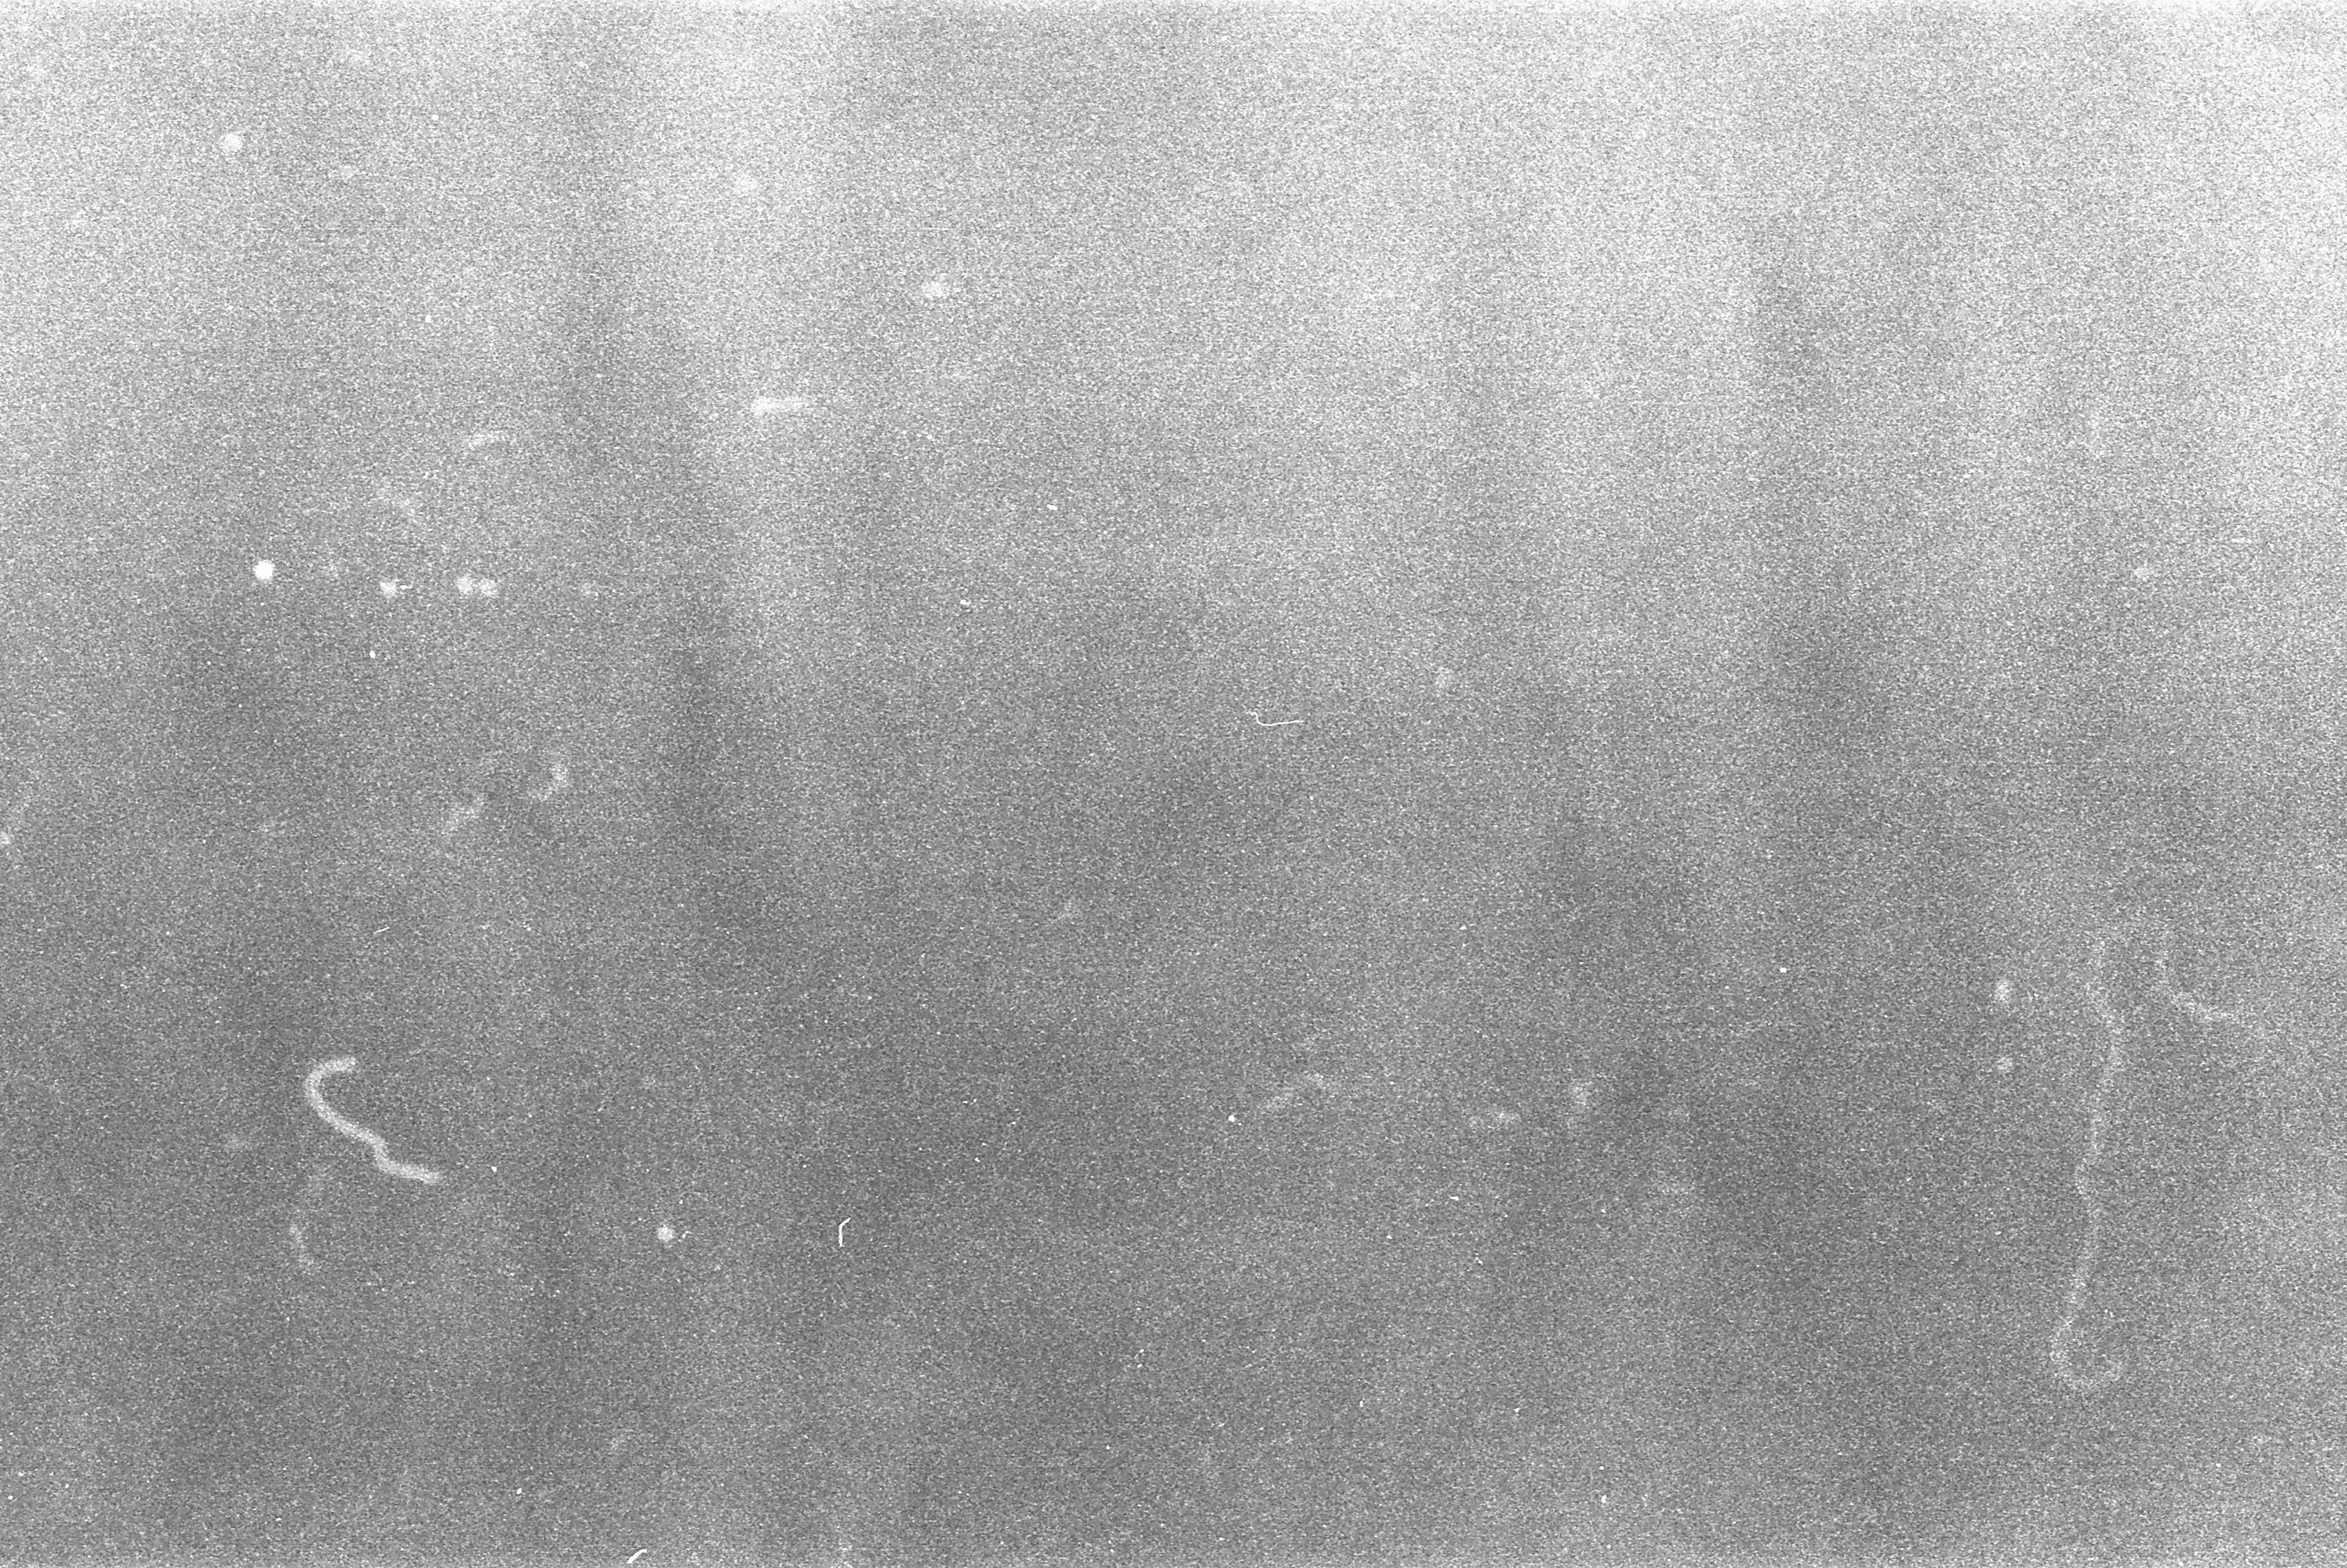 free stock photo of 35mm film grain